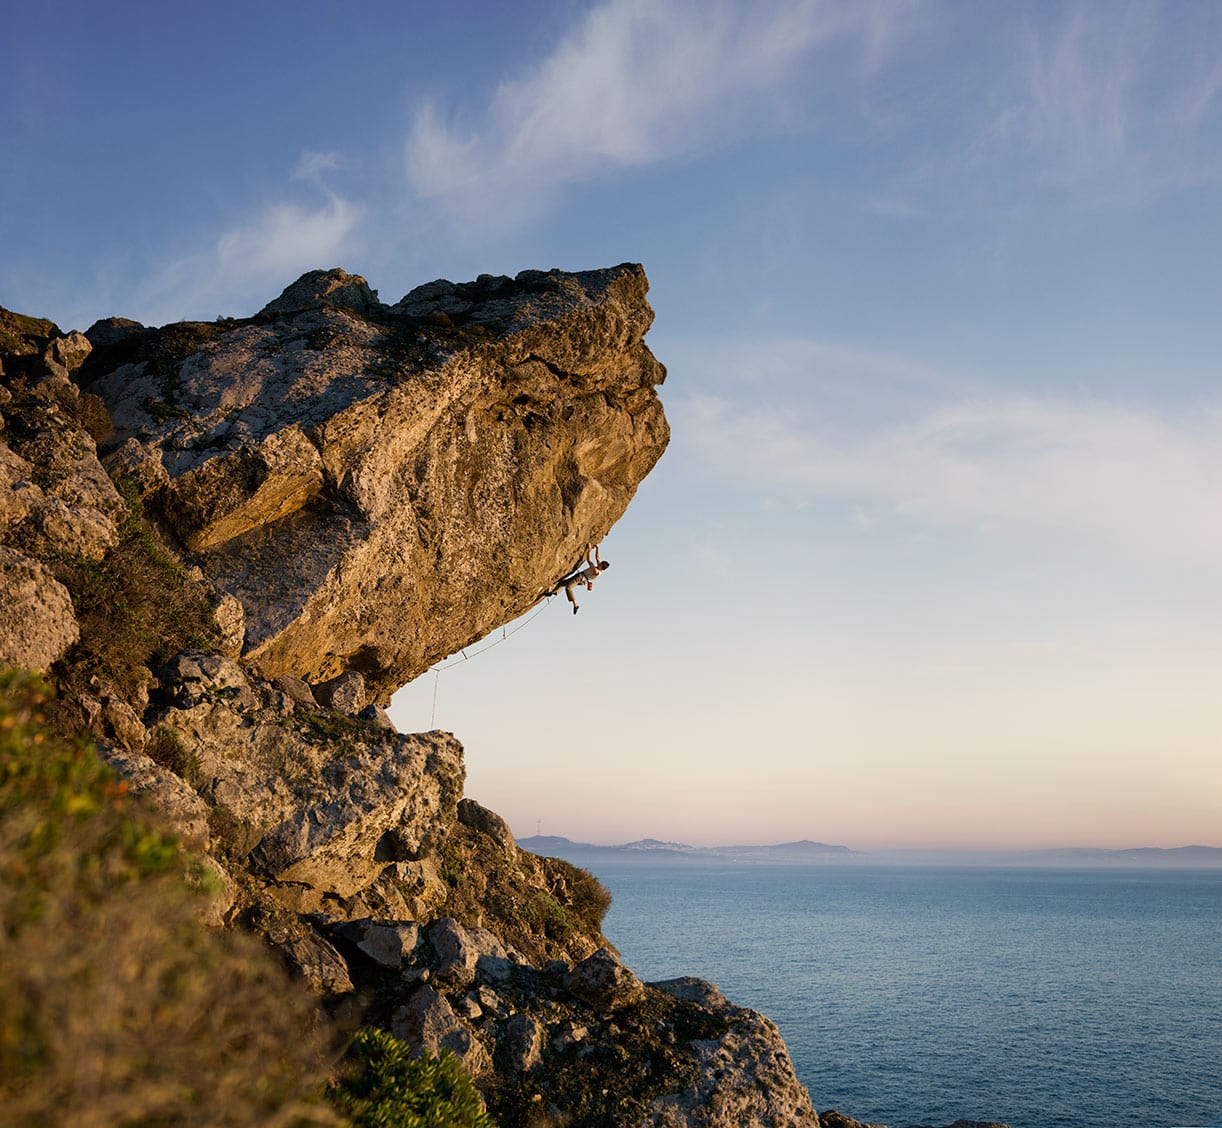 Rod Mclean - man climbing rocks